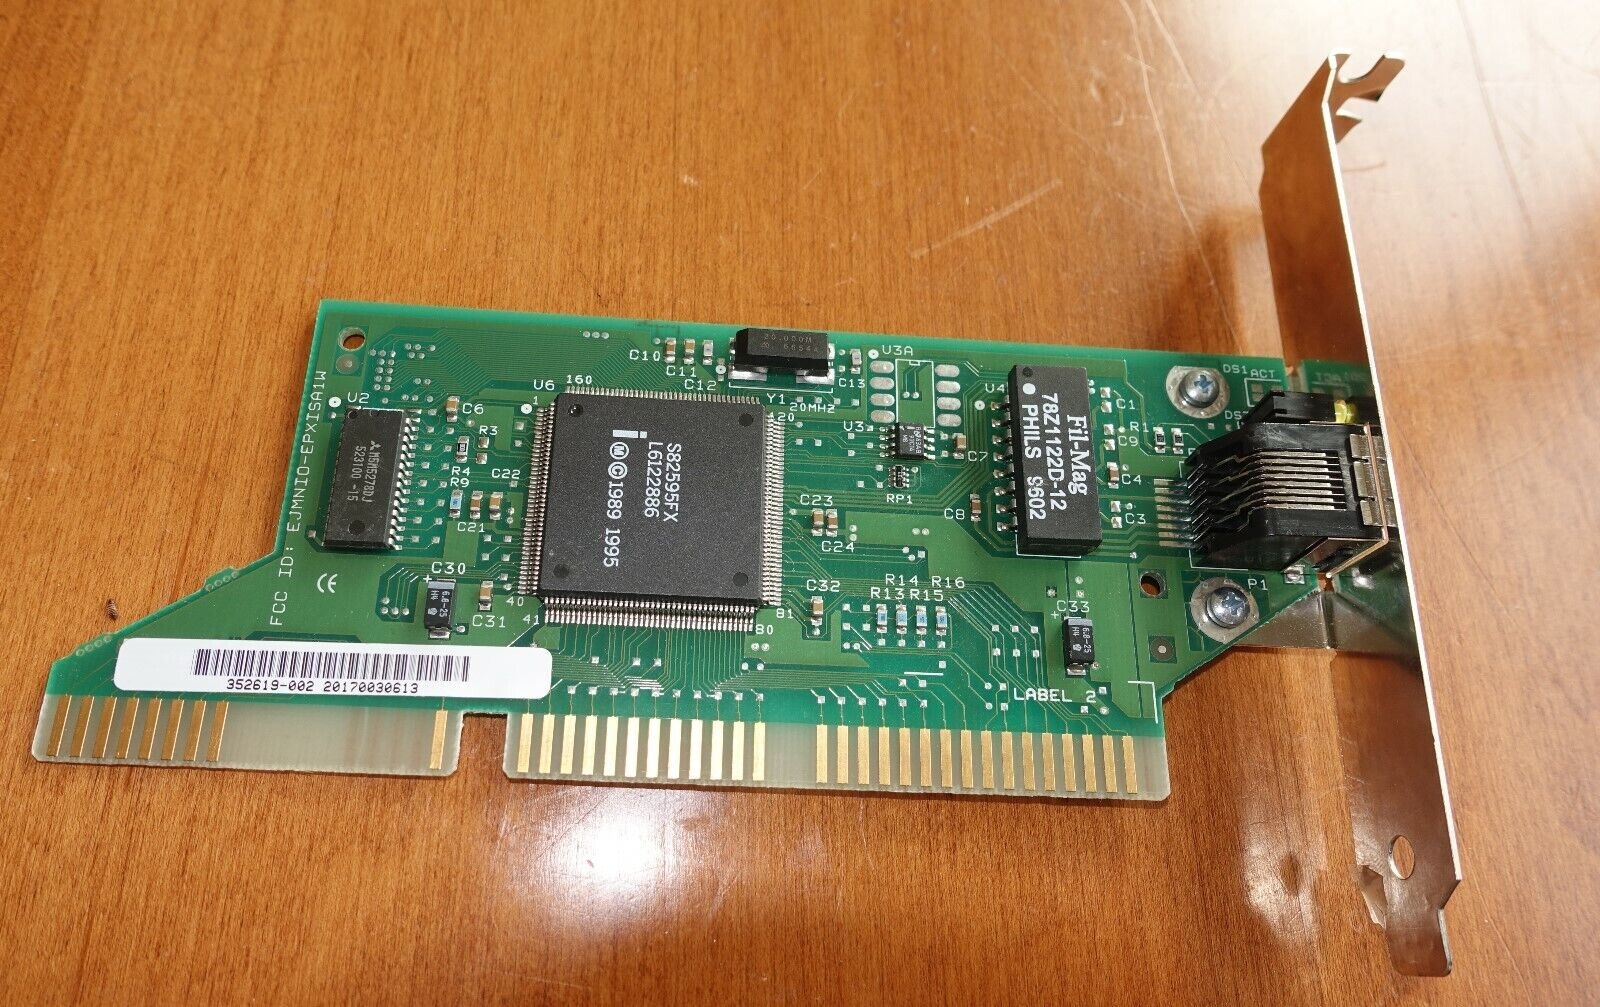 *VINTAGE* 1989 ISA 16 KALEX 352619-002 EJMNIO-EPXISA1W Network Card PC Ethernet